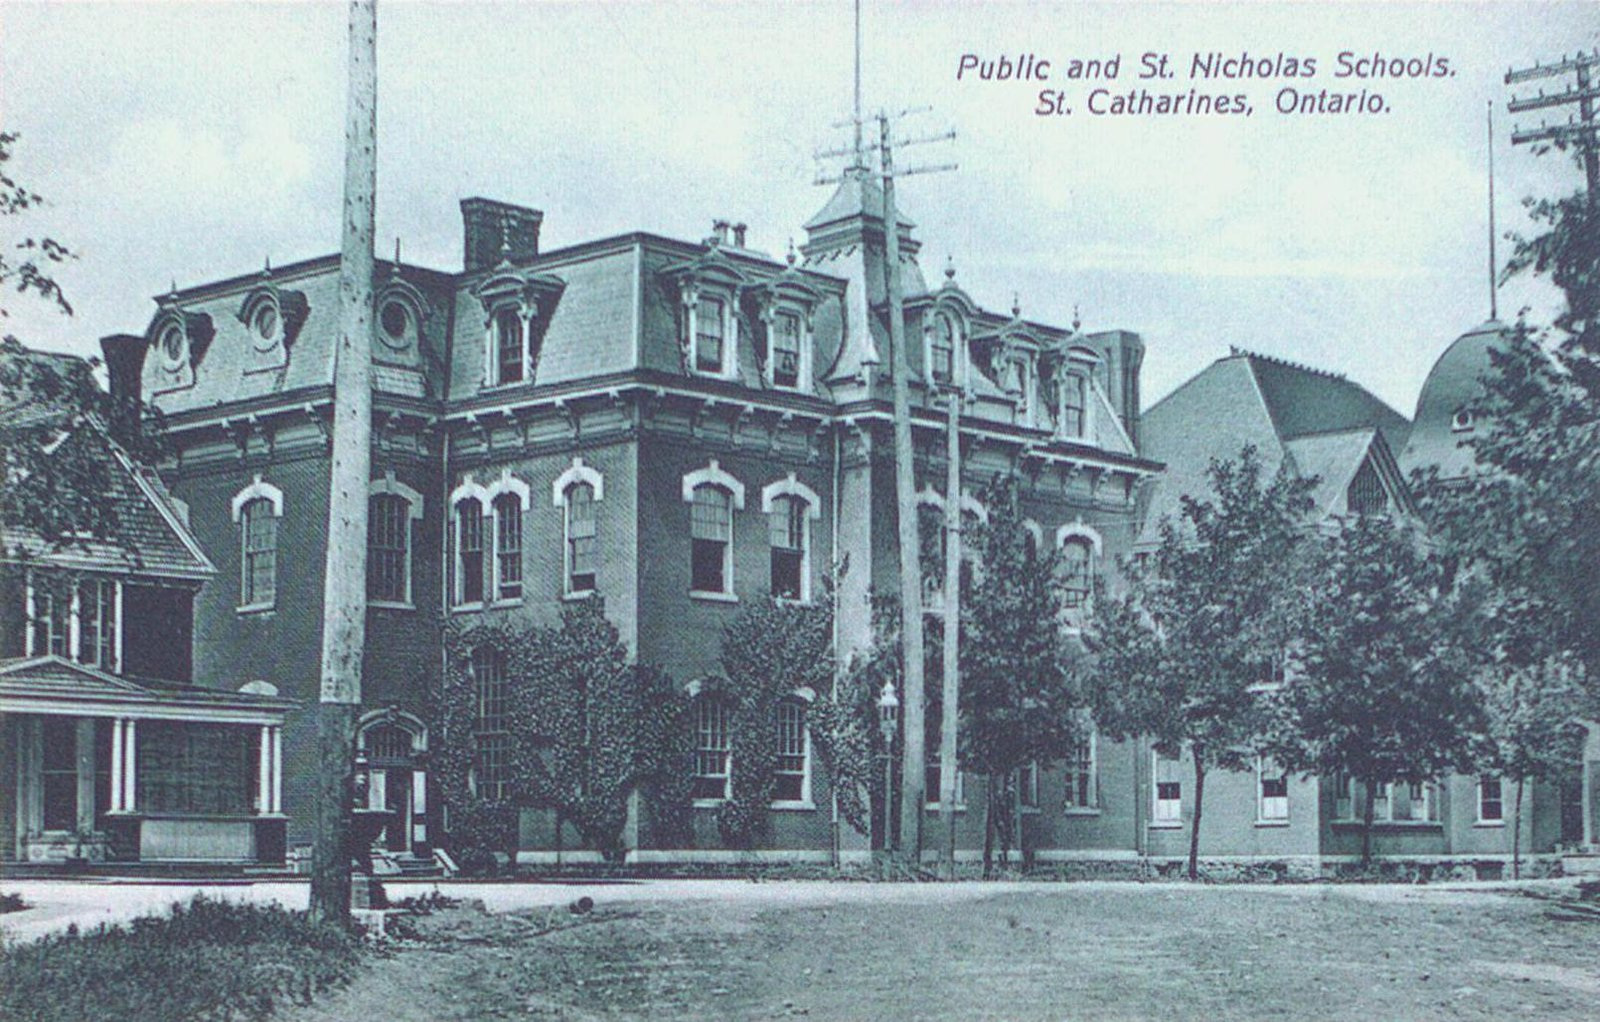 A Public (Central) School & St. Nicholas School